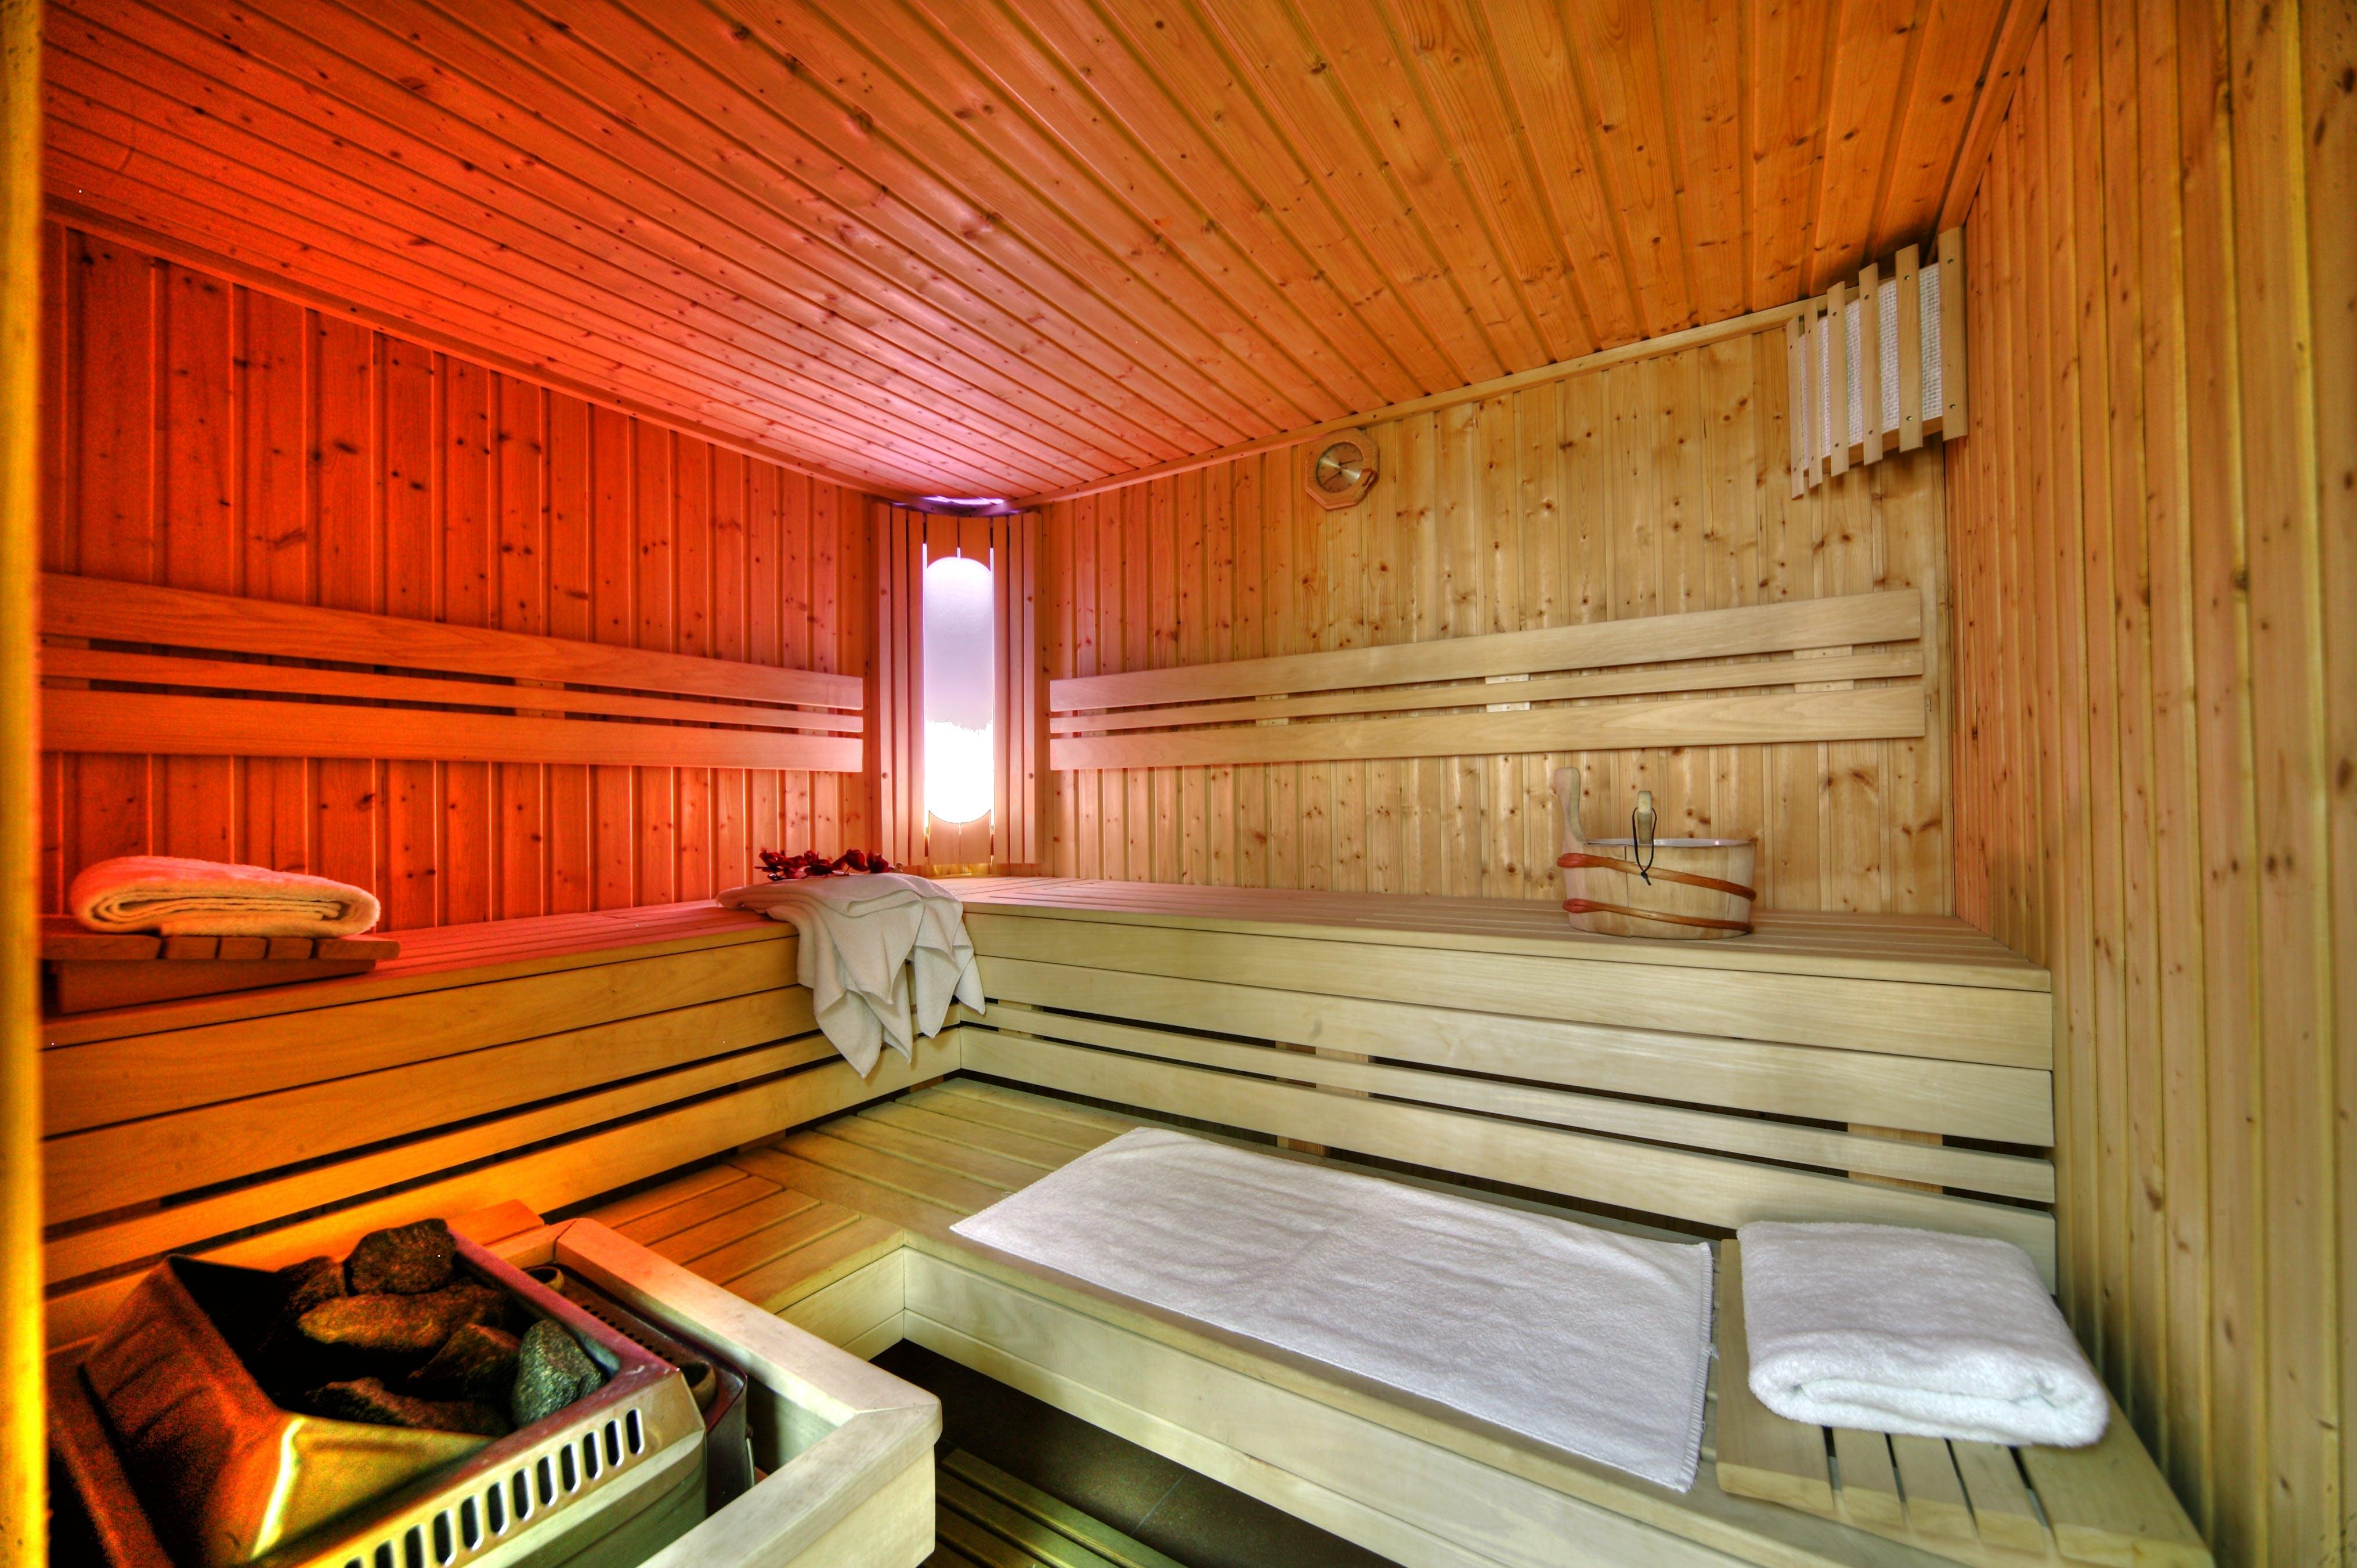 kur wellness in polen villa herkules in swinem nde saison 2019 busreise plosw herku. Black Bedroom Furniture Sets. Home Design Ideas